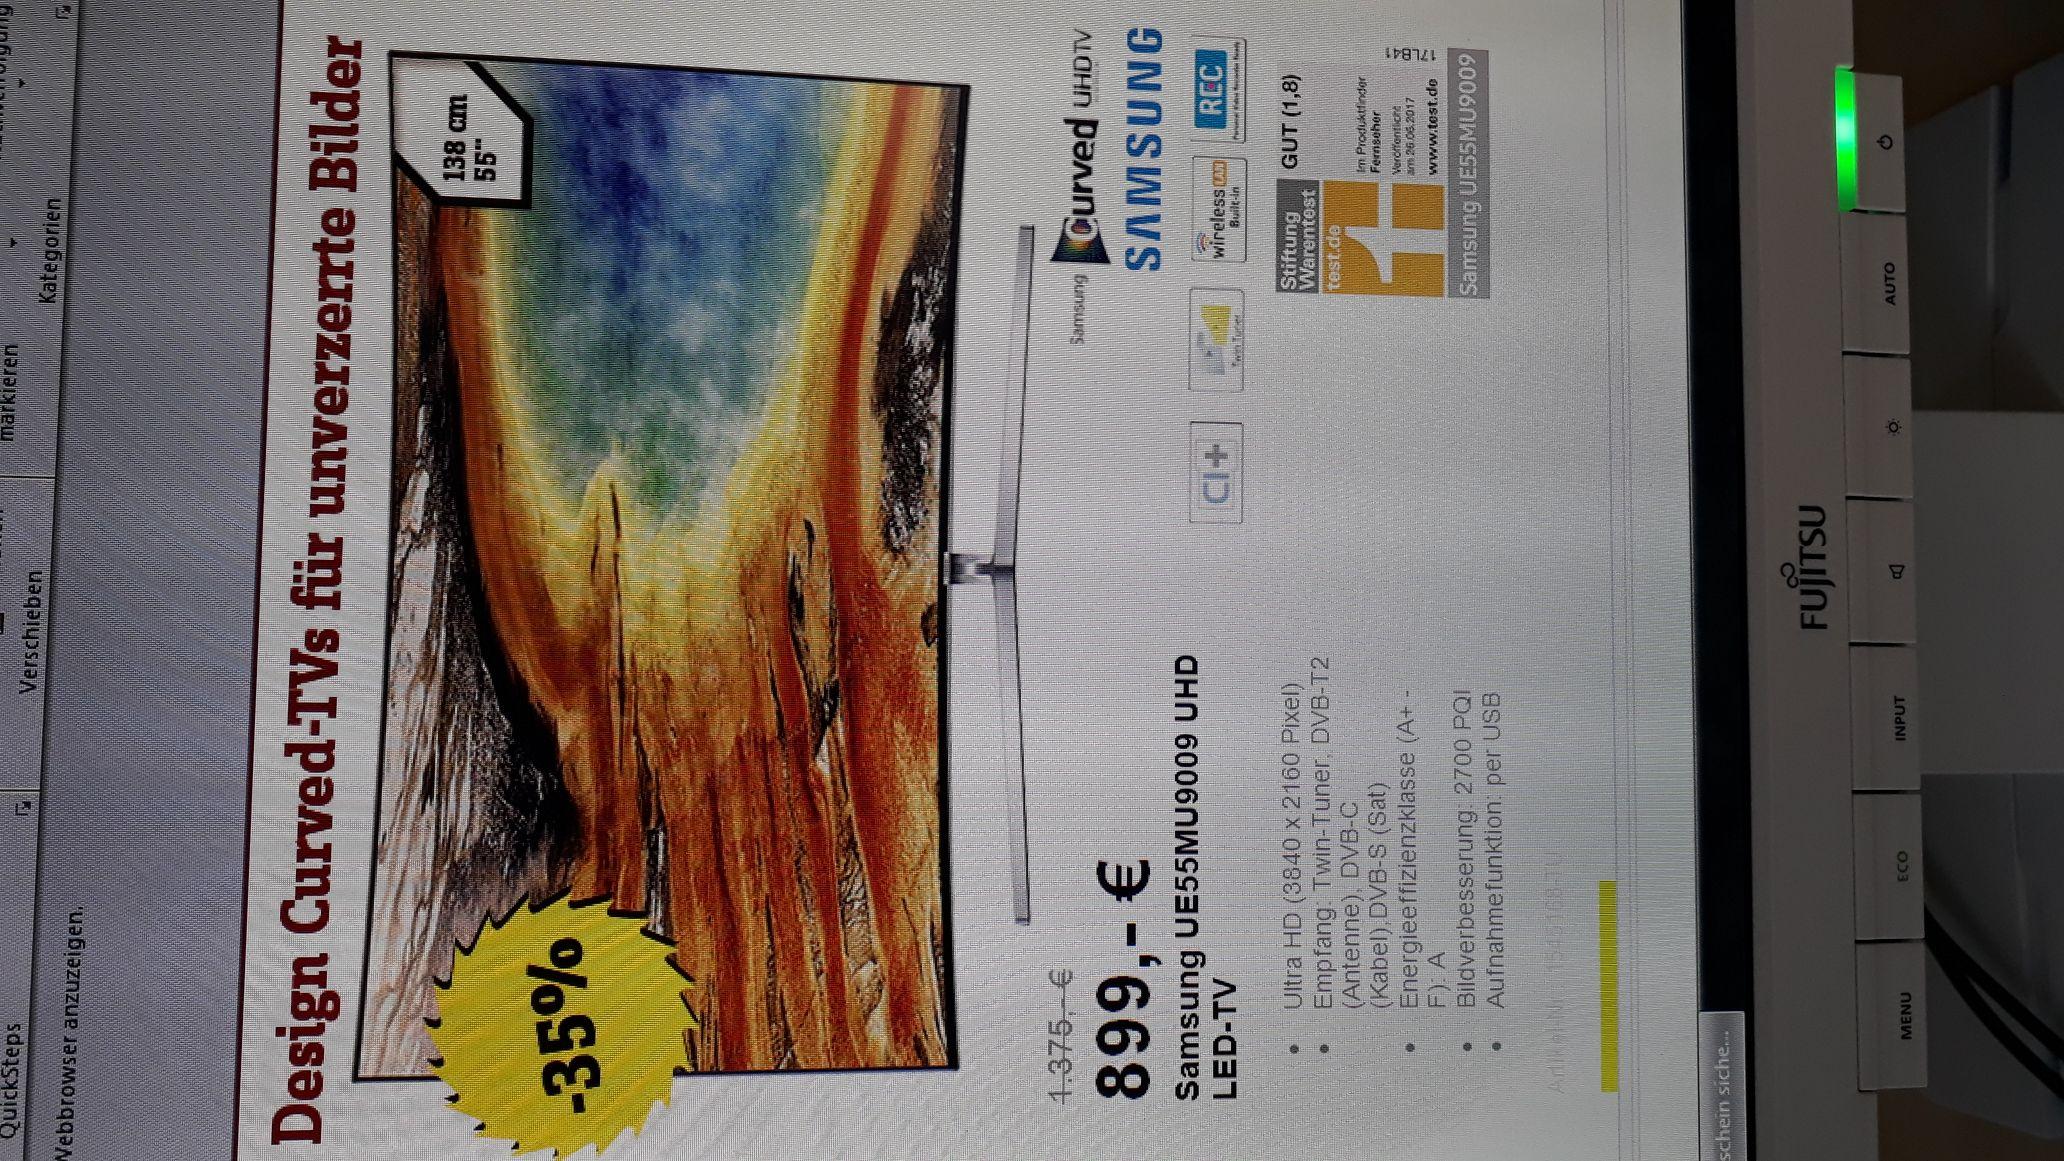 Conrad im NL Samsung 55 MU9009 UHD TV